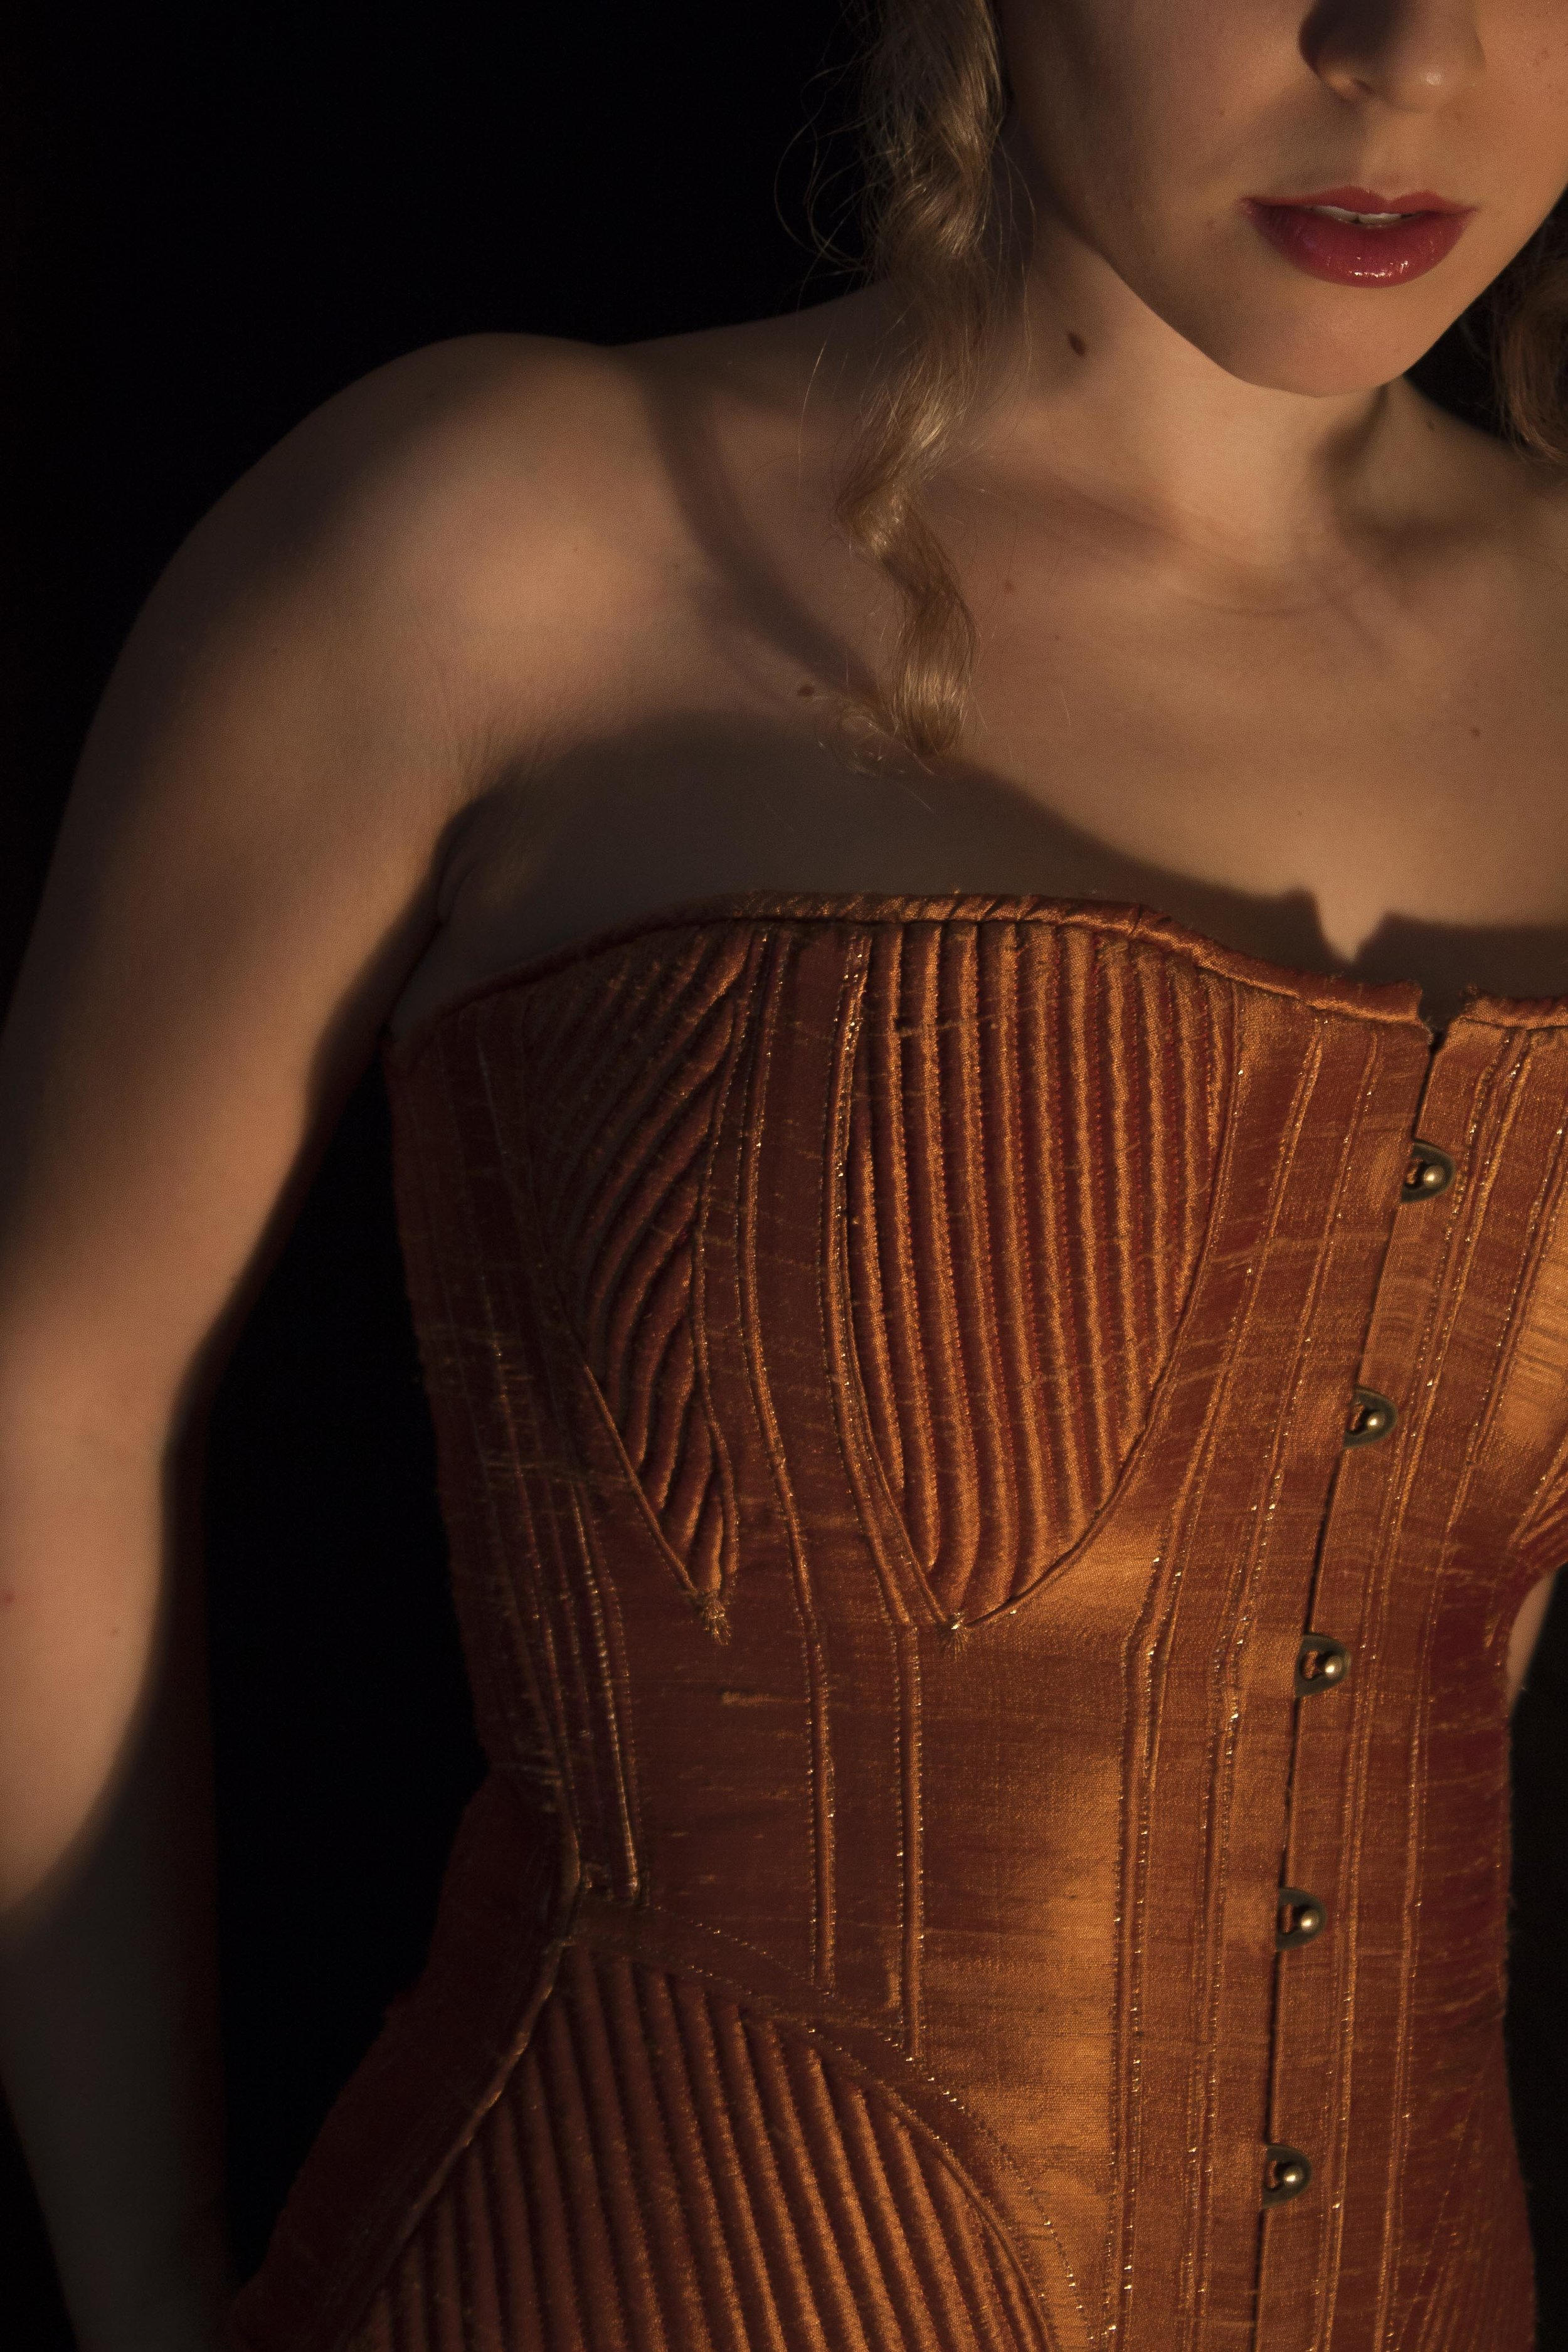 copper-corset-detail.jpg